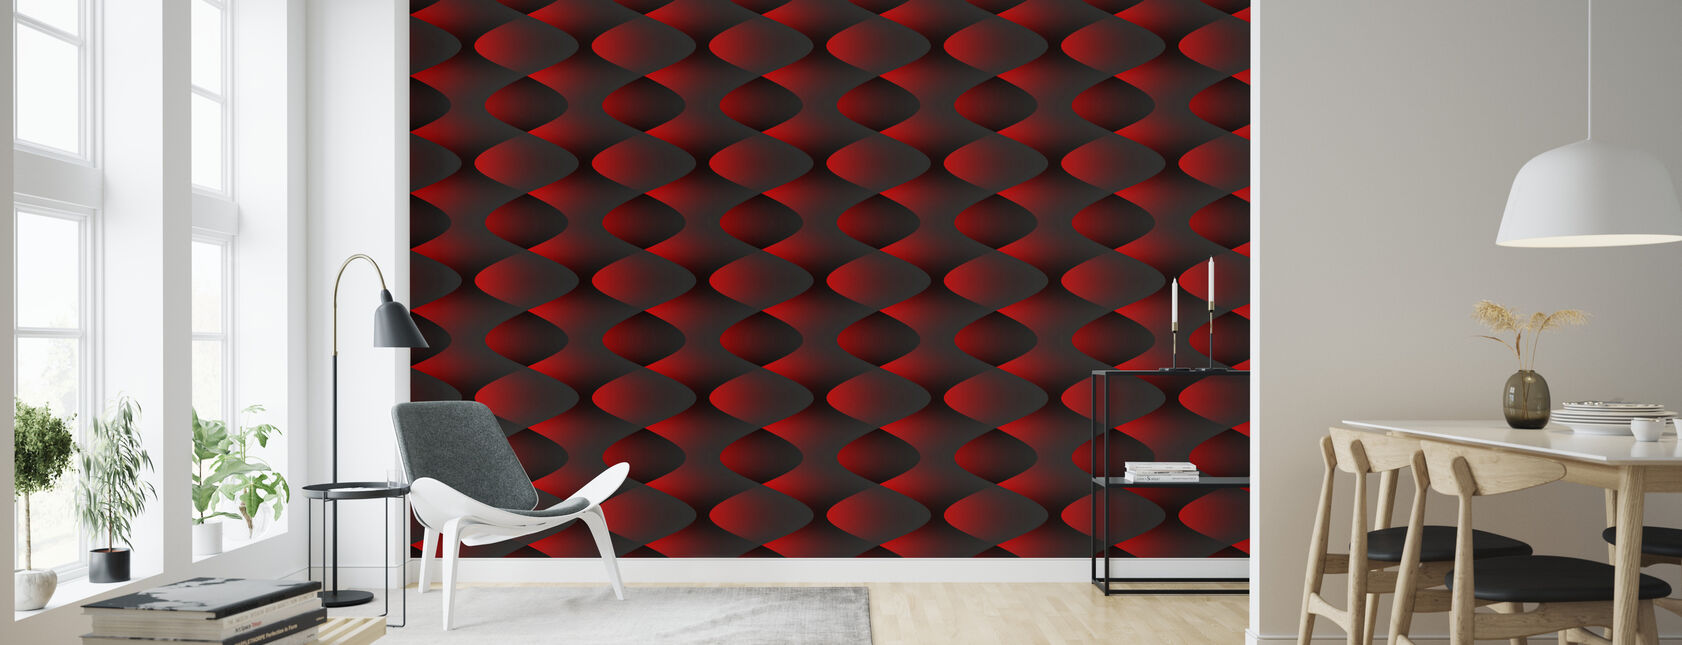 Red - Wallpaper - Living Room